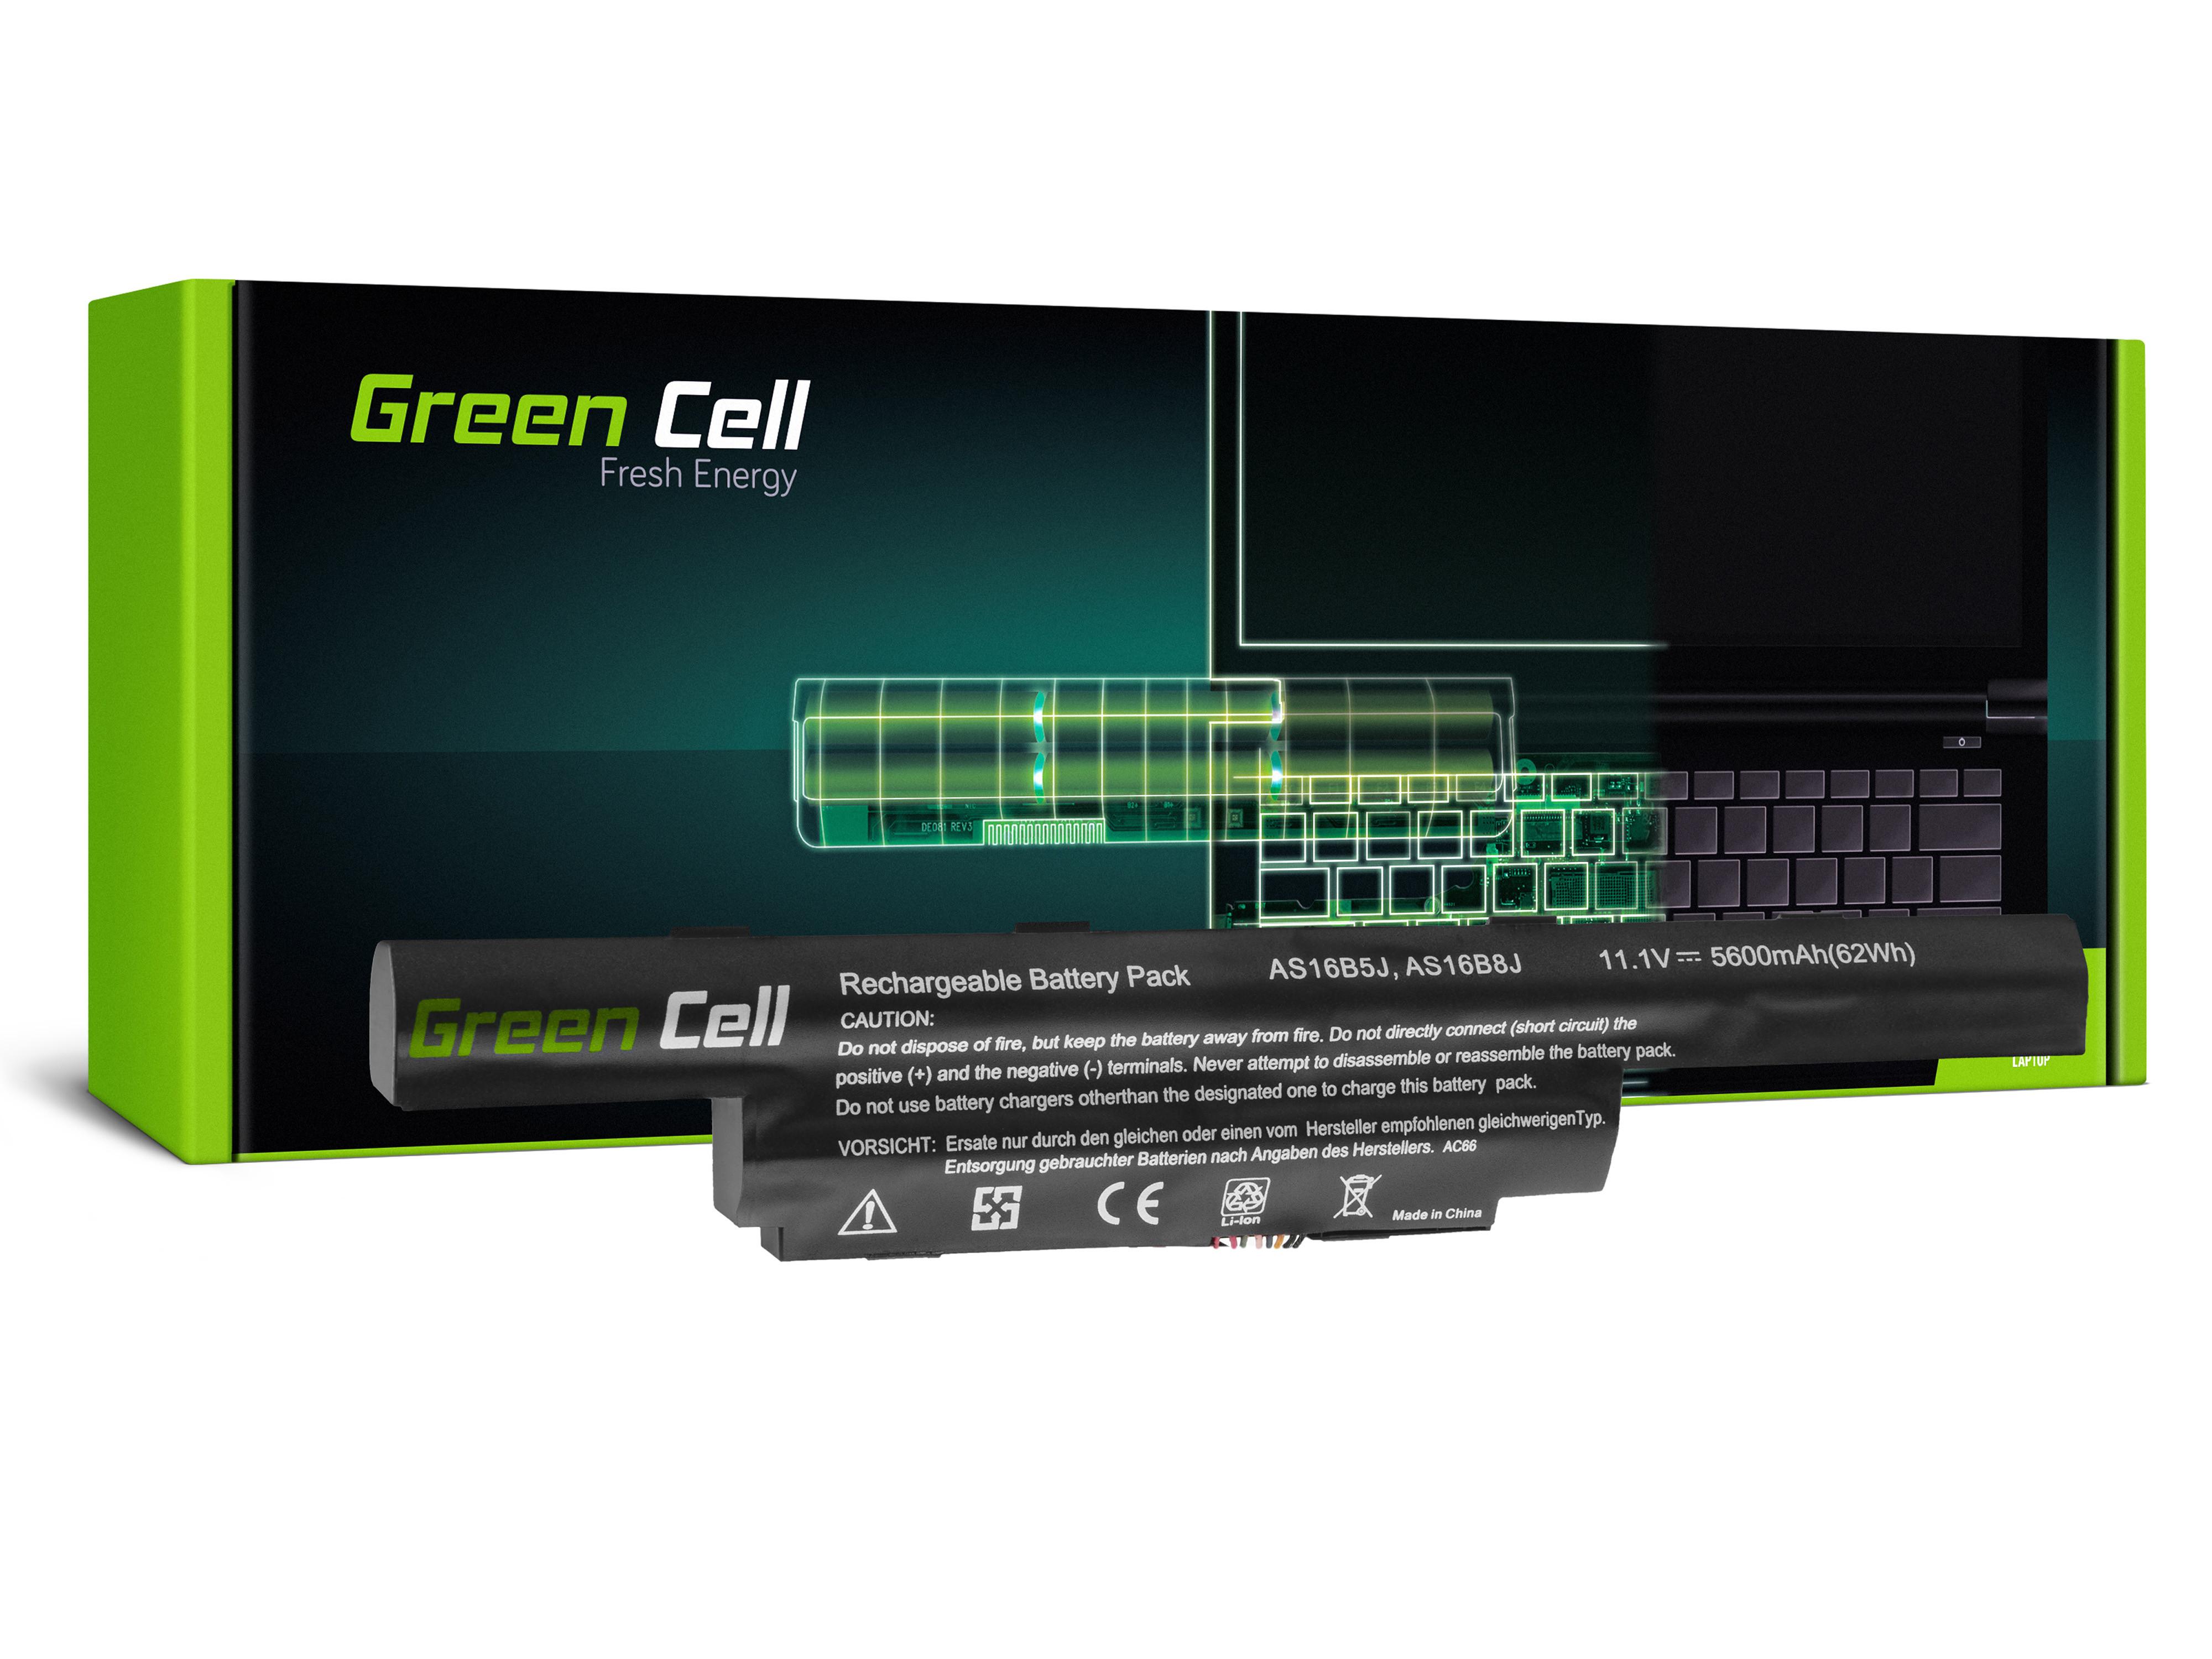 Green Cell AC66 Baterie Acer AS16B5J,AS16B8J, Acer Aspire E15 E5-575 E5-575G F15 F5-573 F5-573G TravelMate P259 P259-M P259-G2-M 5200mAh Li-Pol - neoriginální